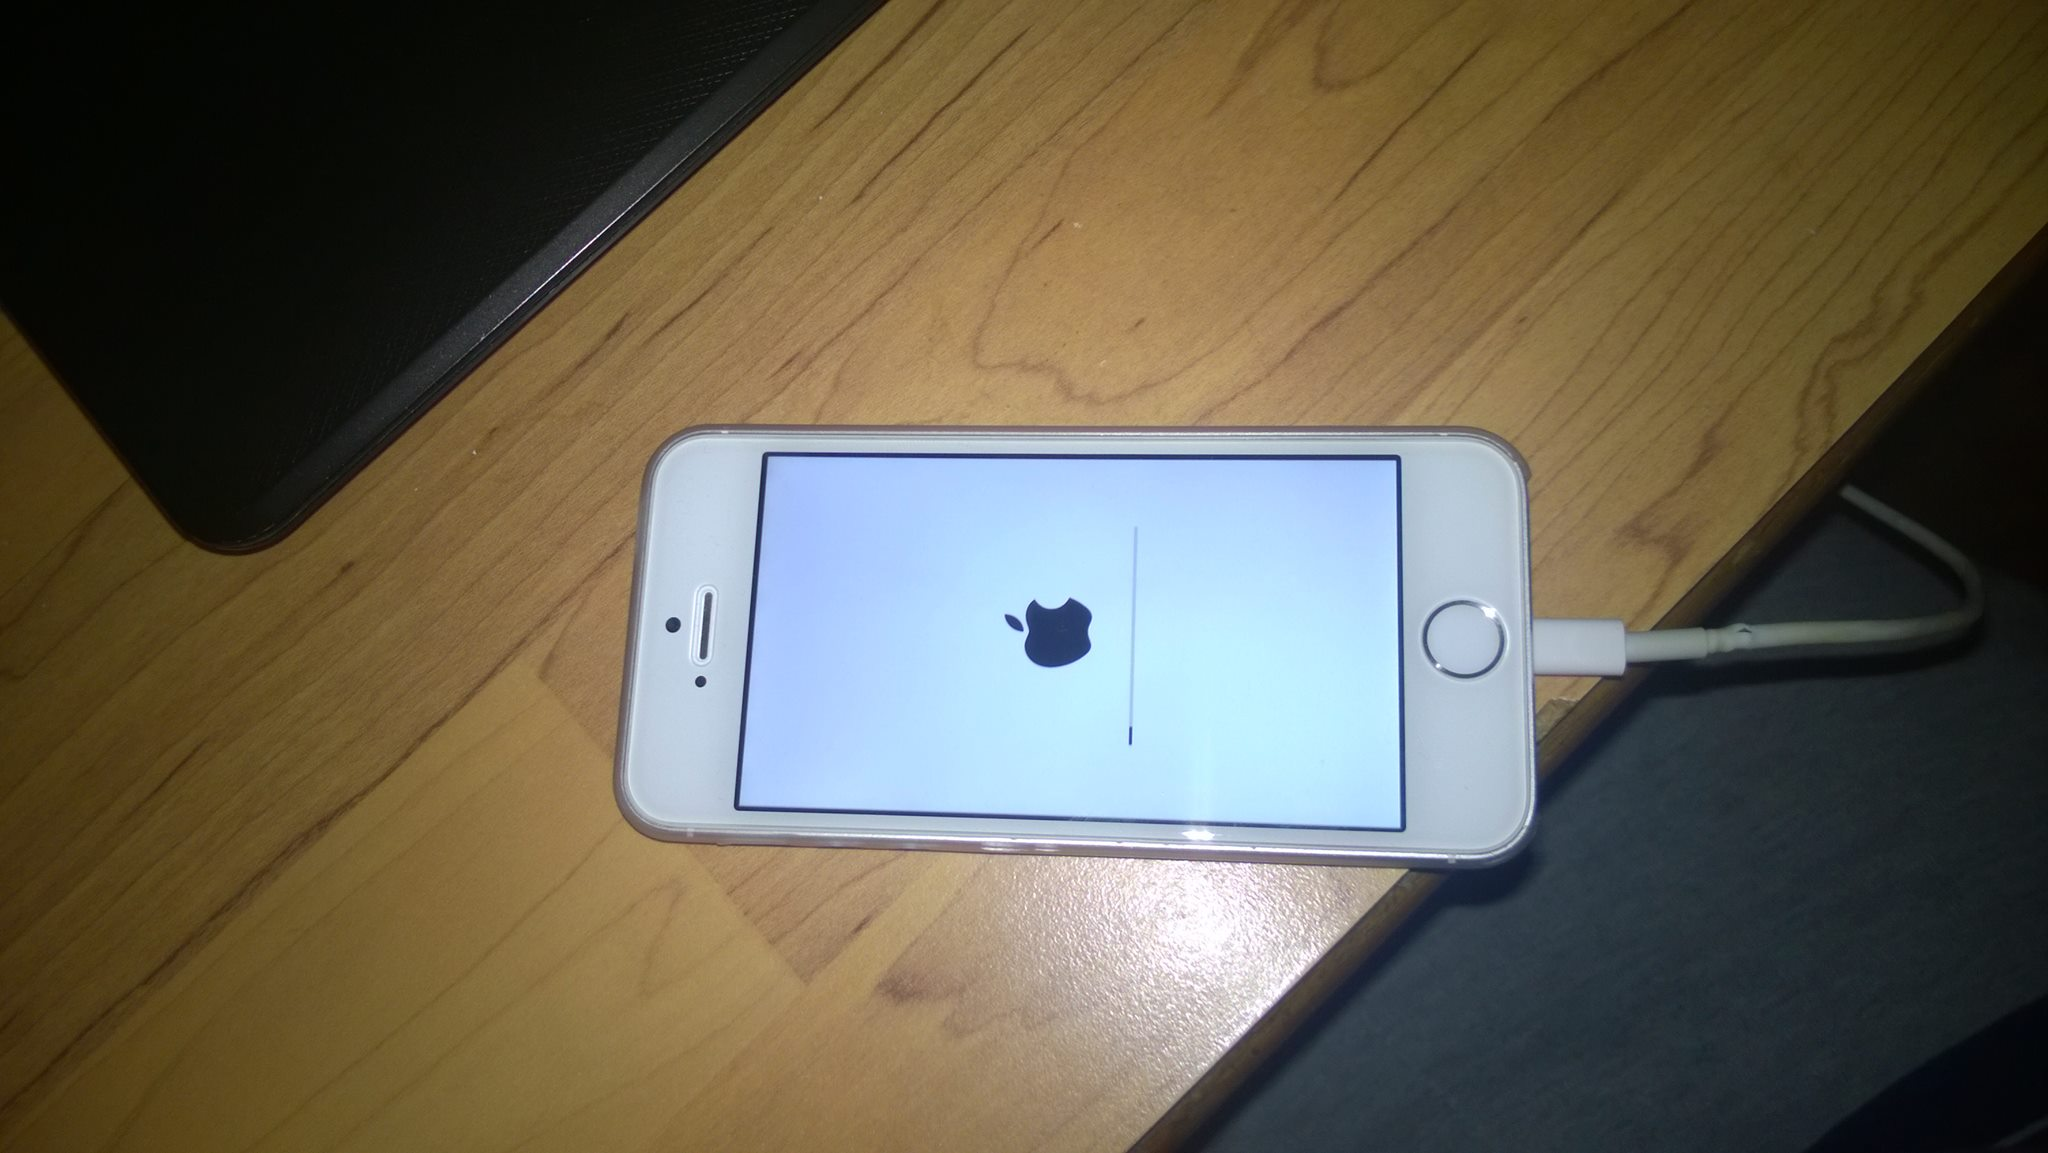 iphone 5s stuck on apple logo screen